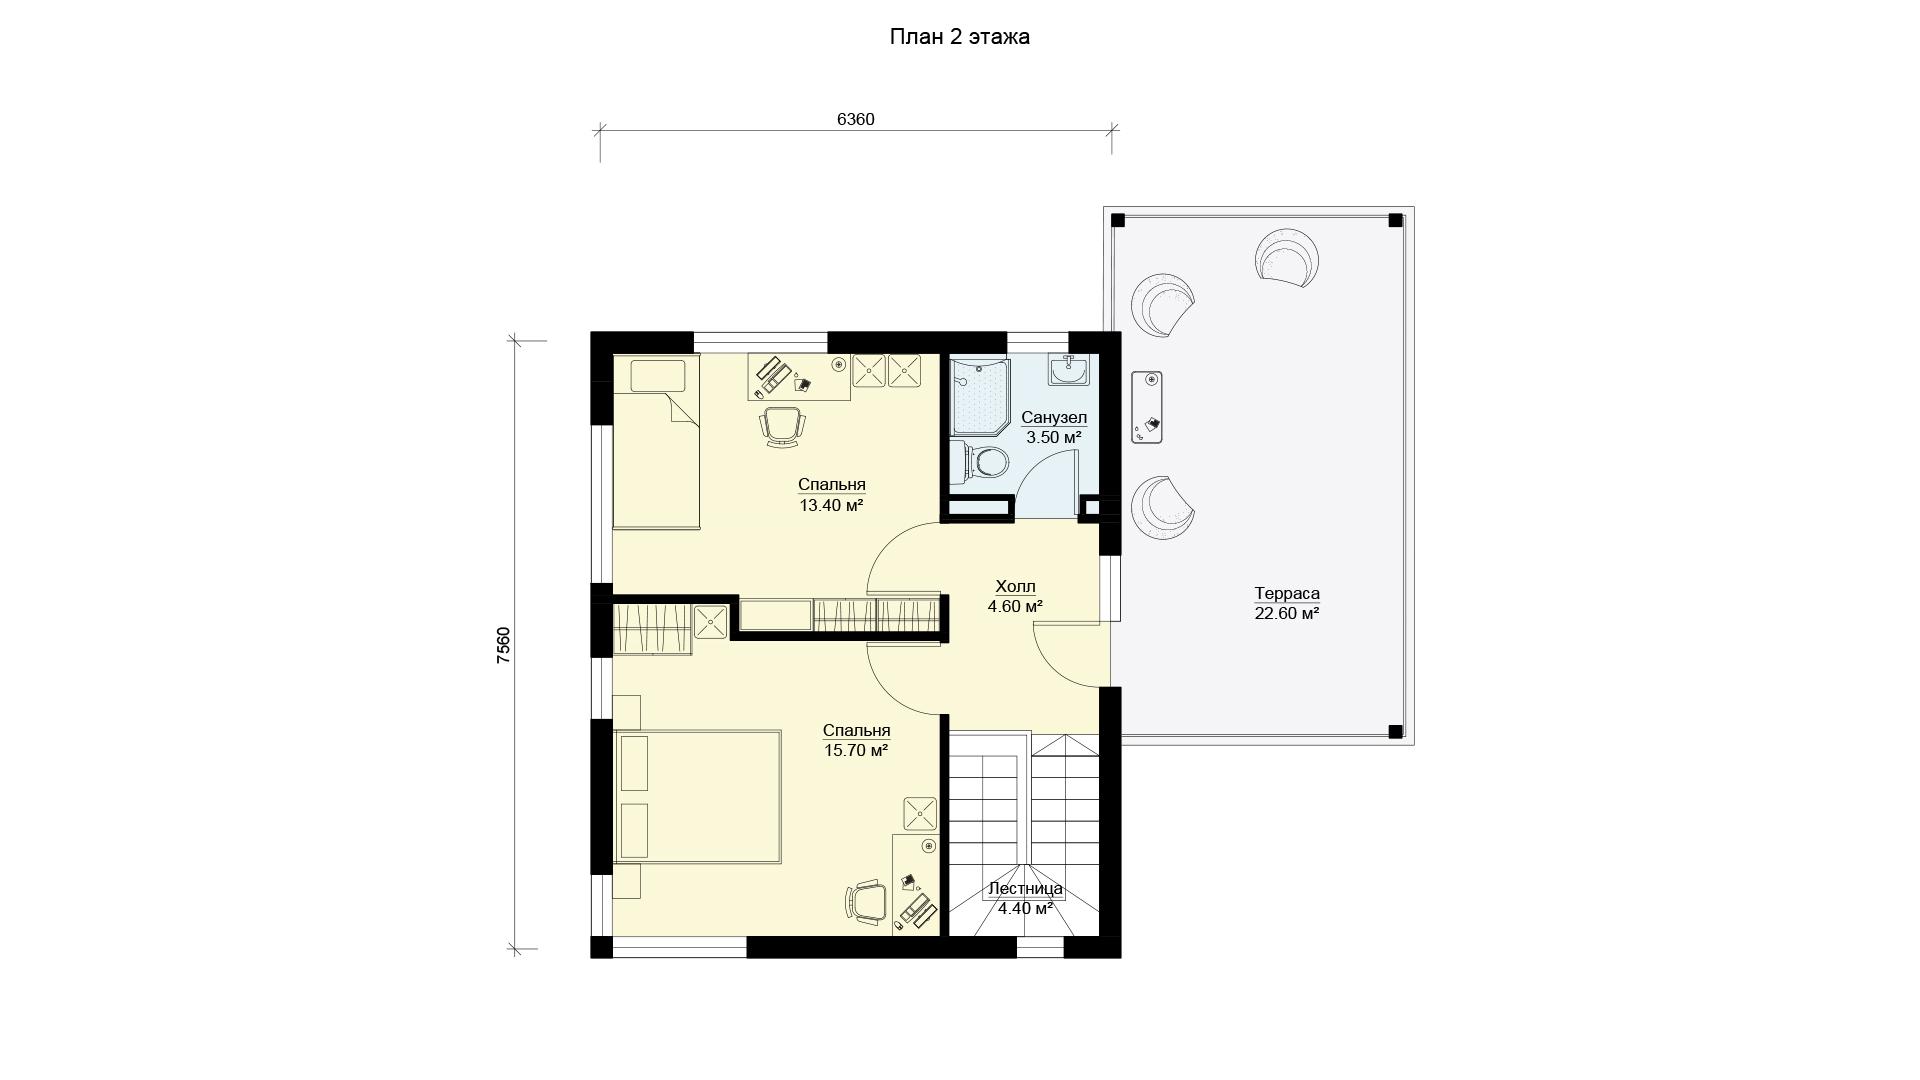 План второго этажа двухэтажного дома БЭНПАН, проект МС-176/3.